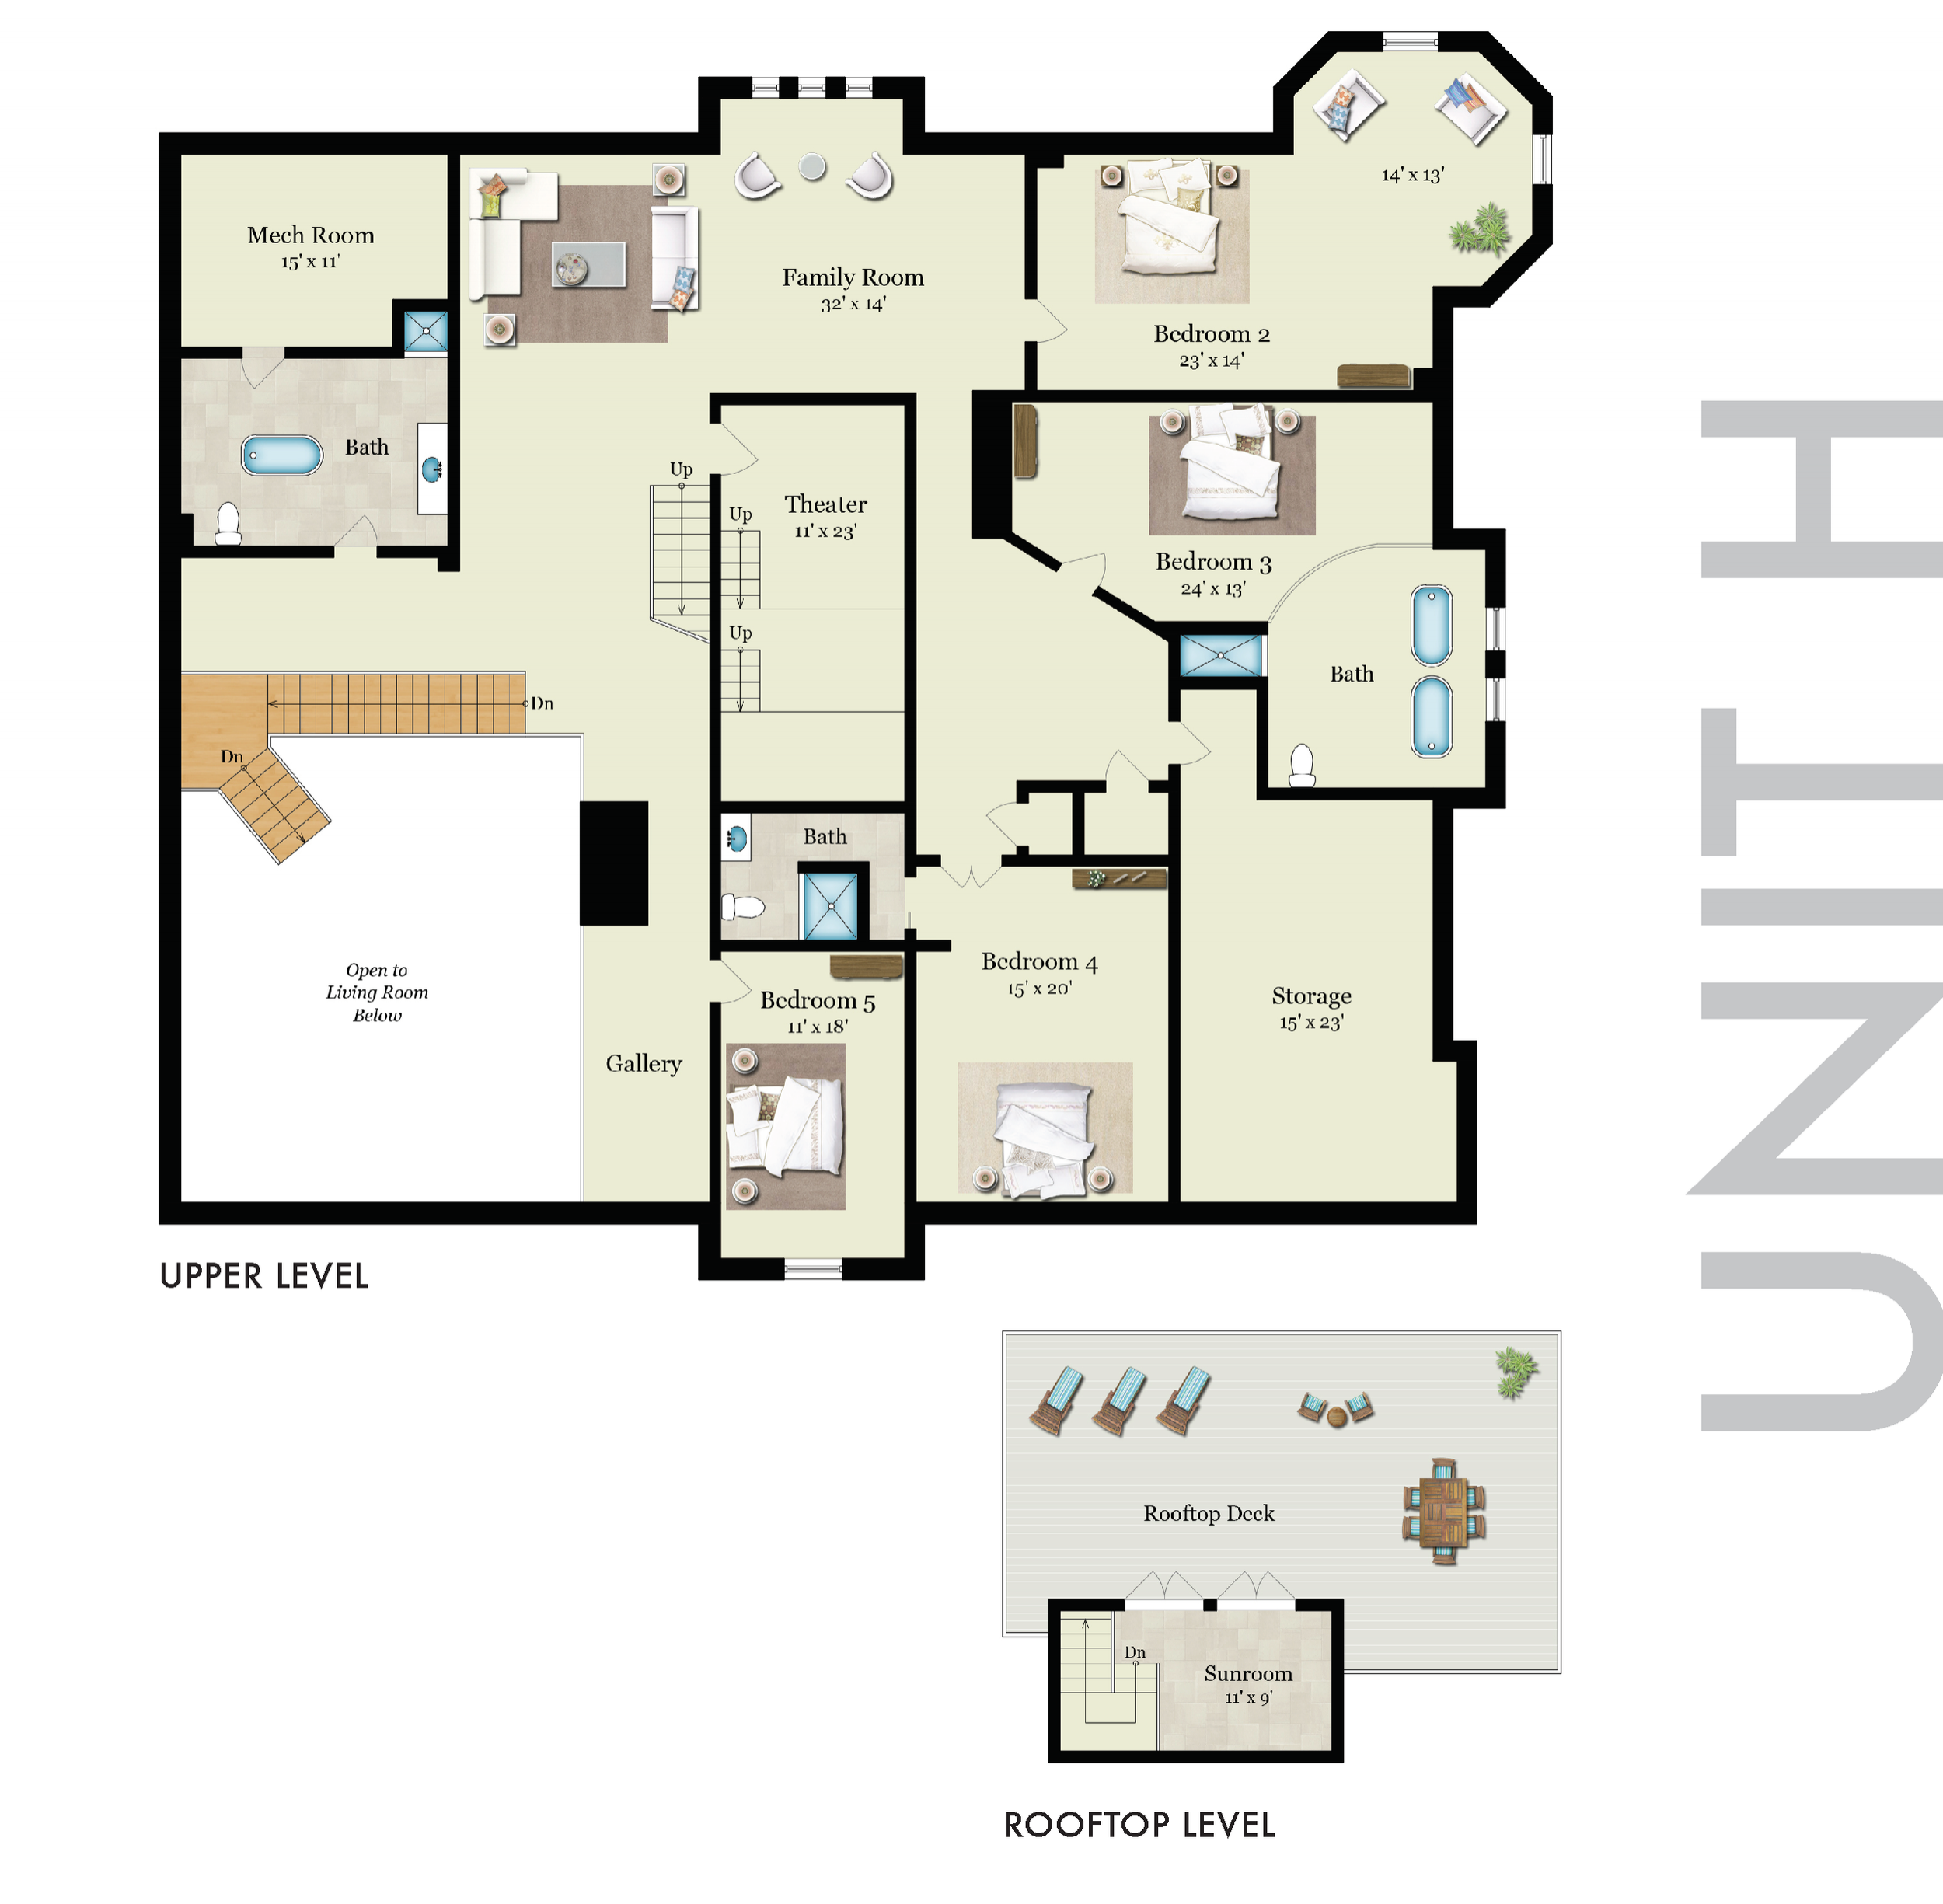 PierceSchoolLofts_floorplans_PNG_H2.png